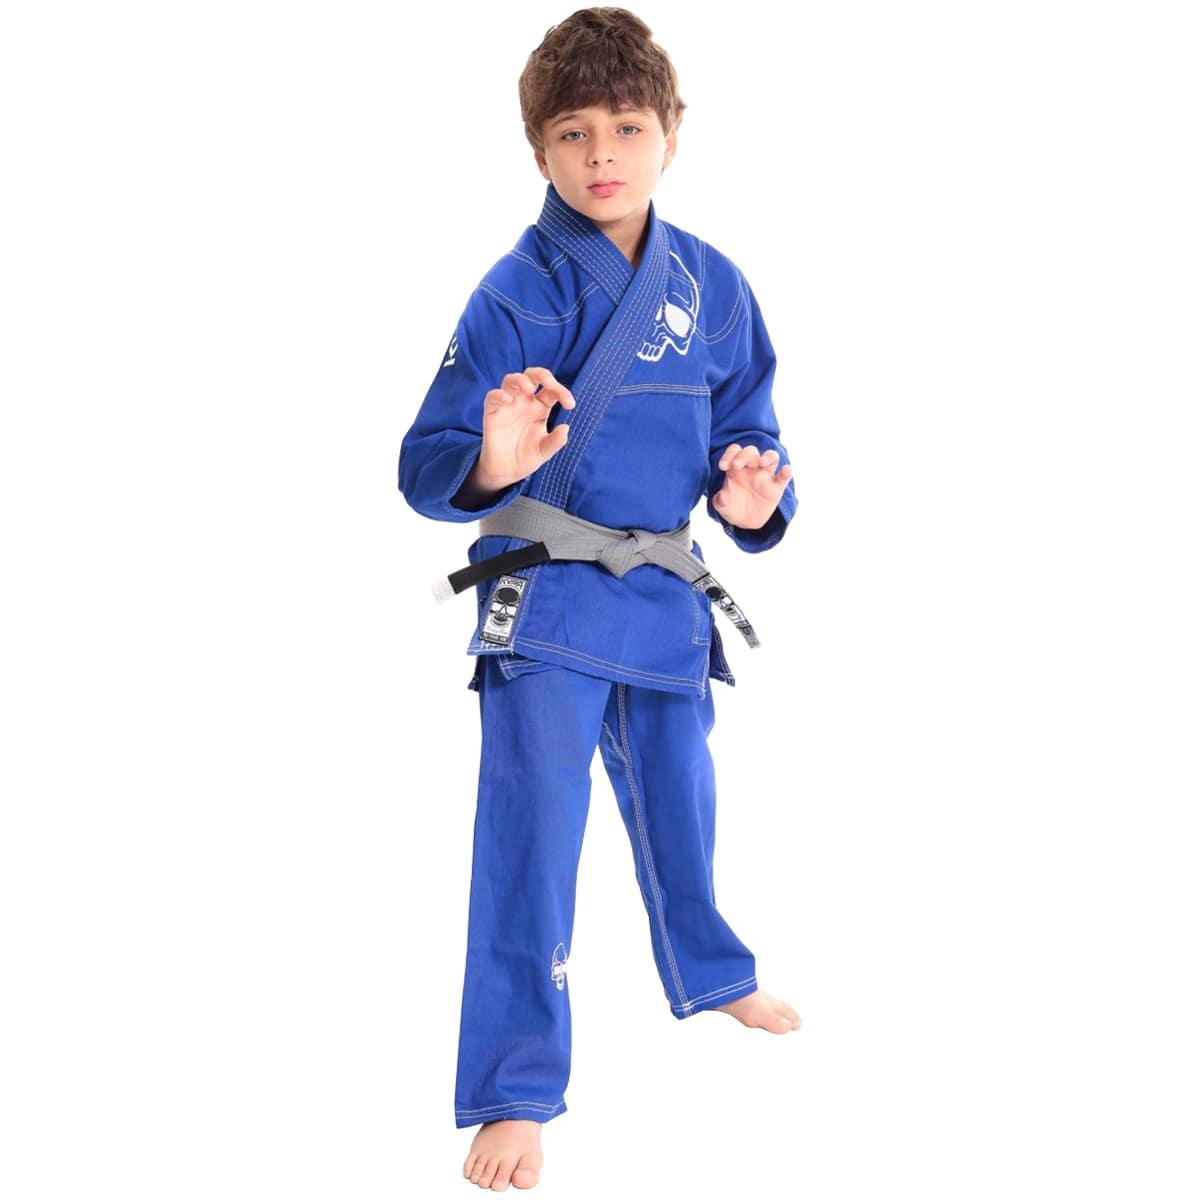 Kimono Jiu-Jitsu Infantil Kvra Alfa - Azul